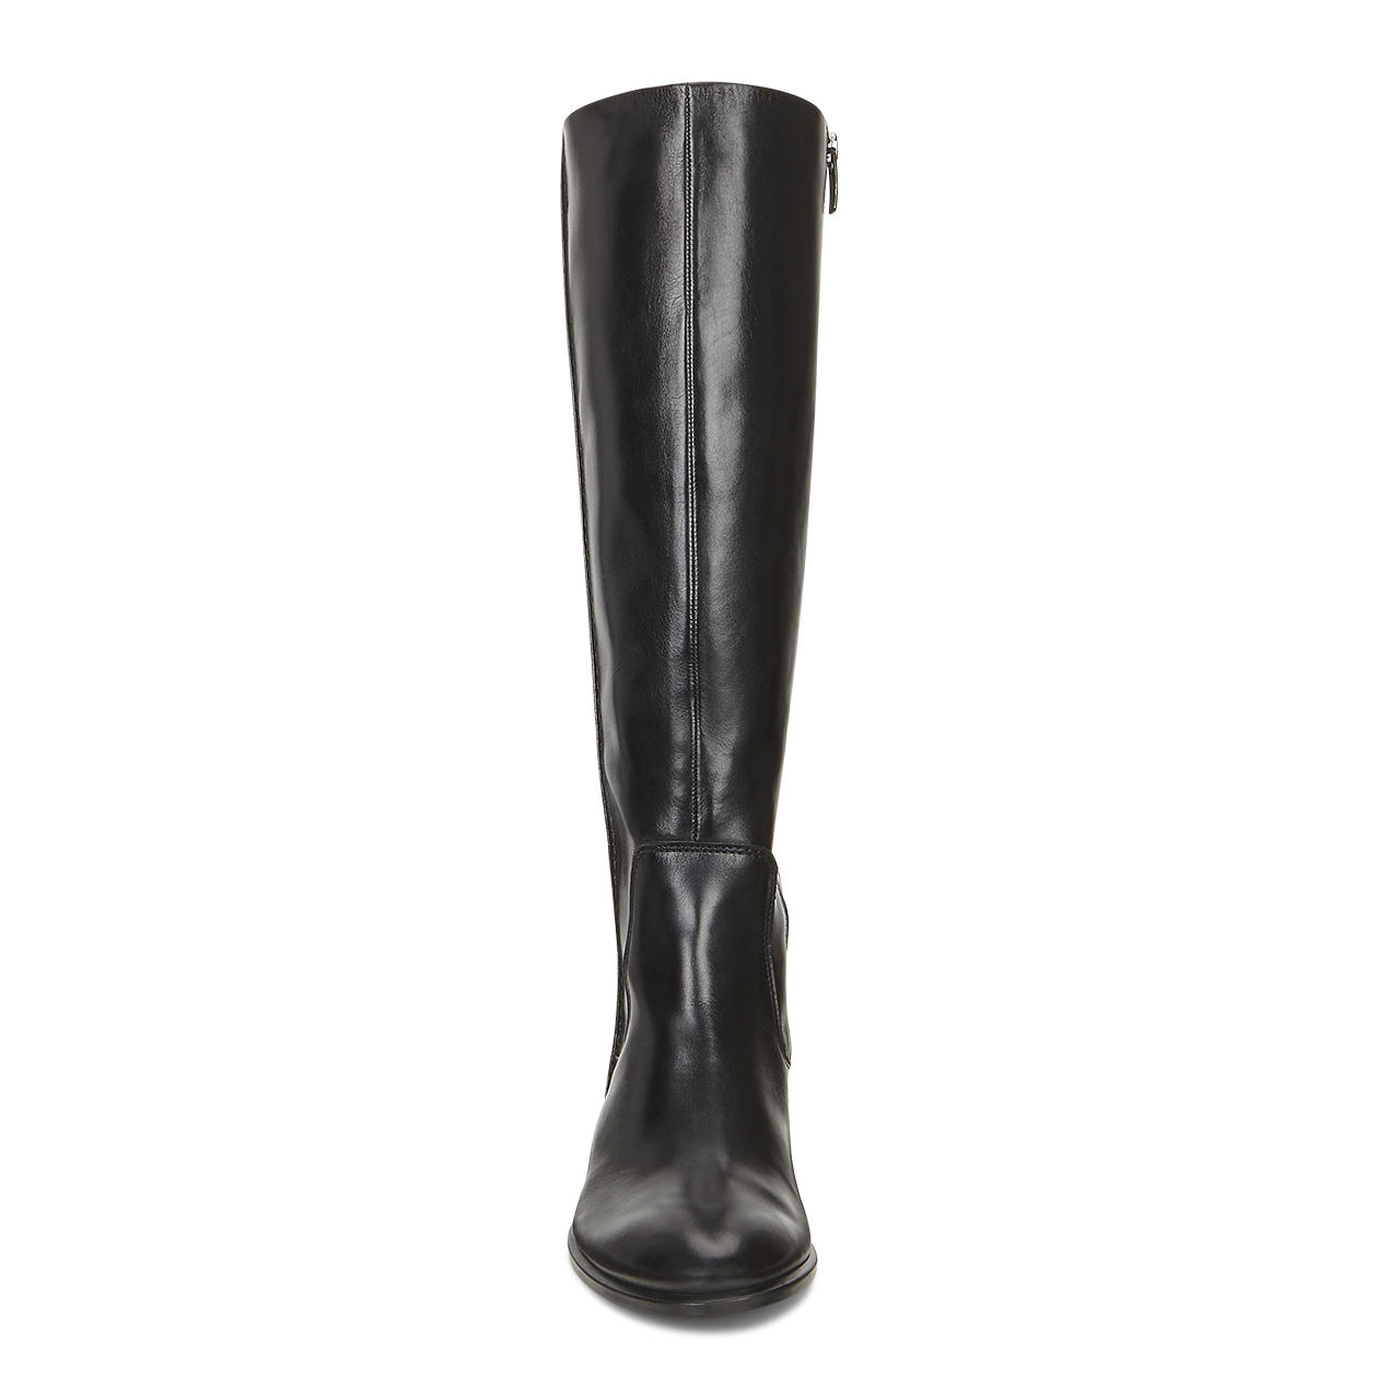 ECCO SHAPE 55 High-cut Boot